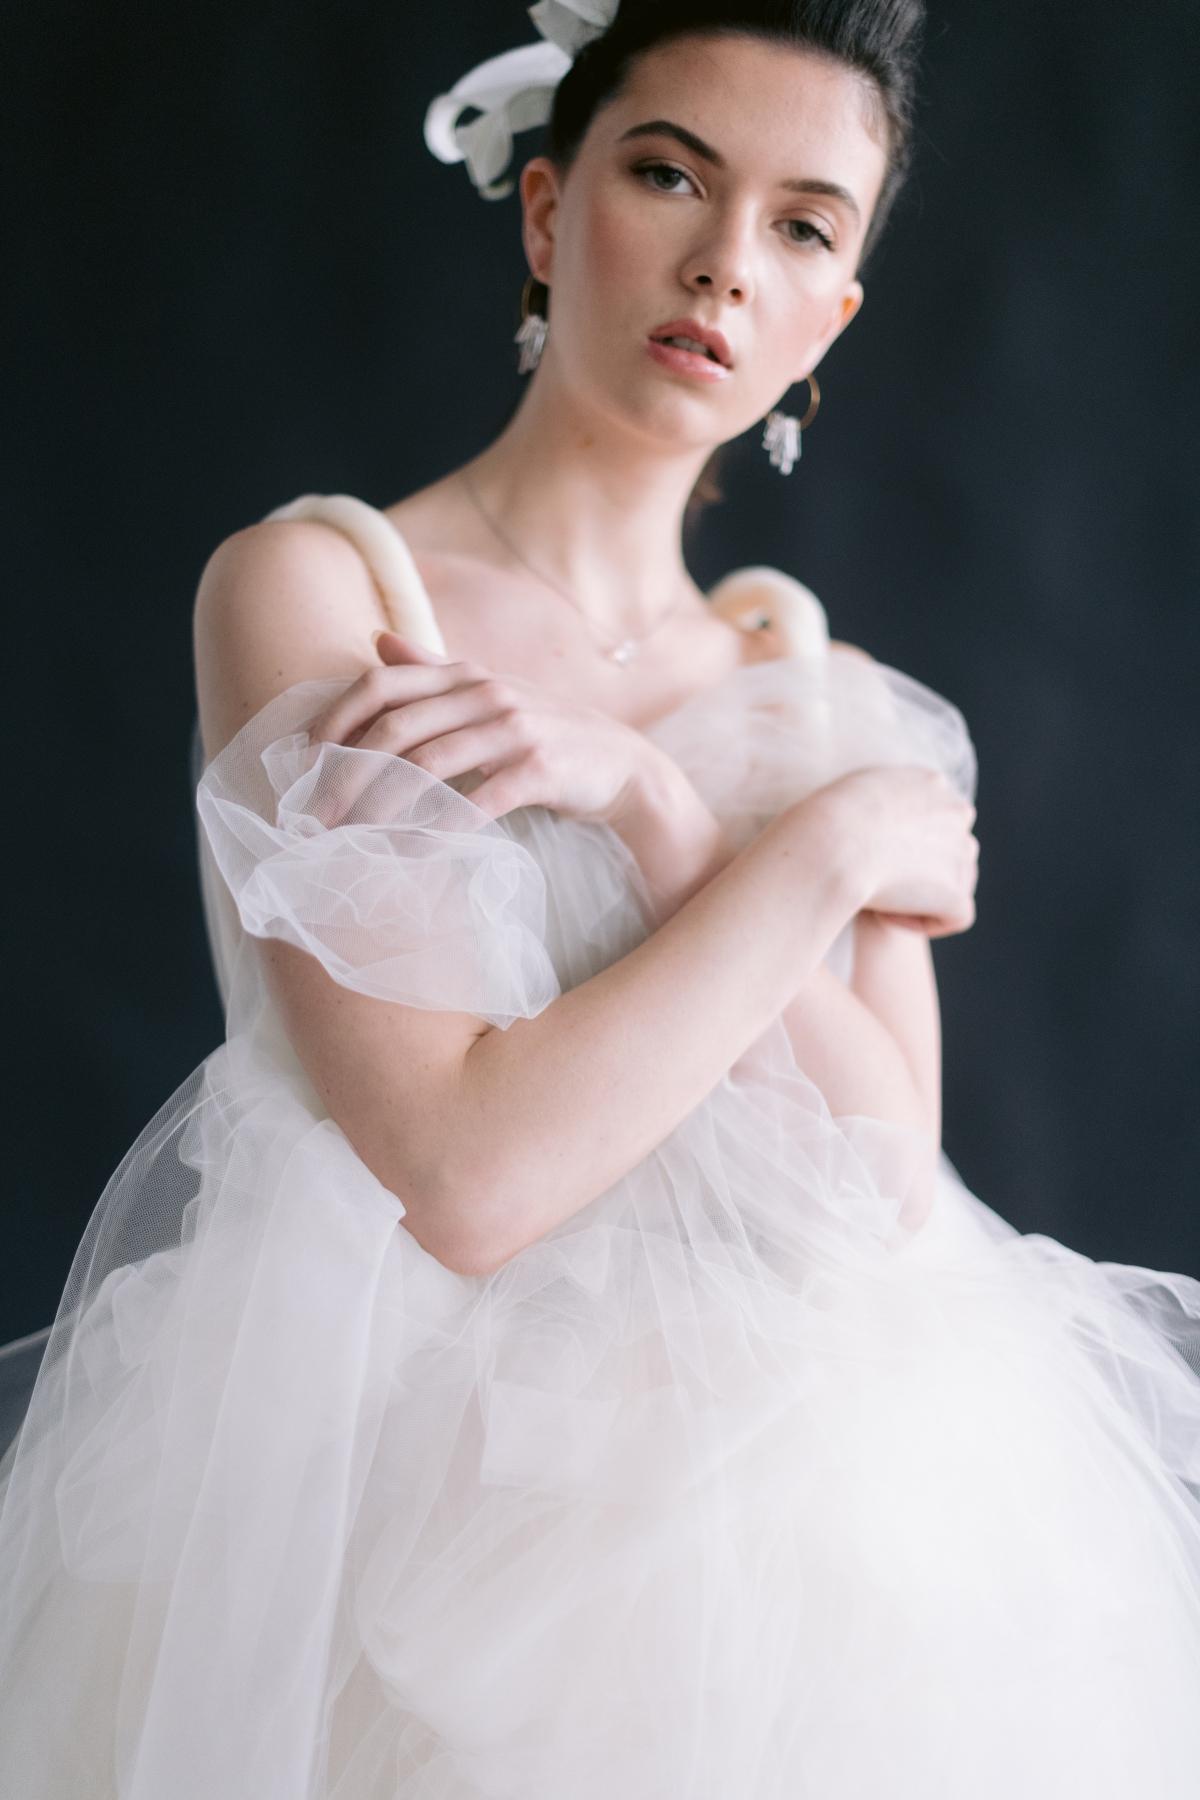 Laura Lanzerotte Bridal Danielle Heinson Photography 76